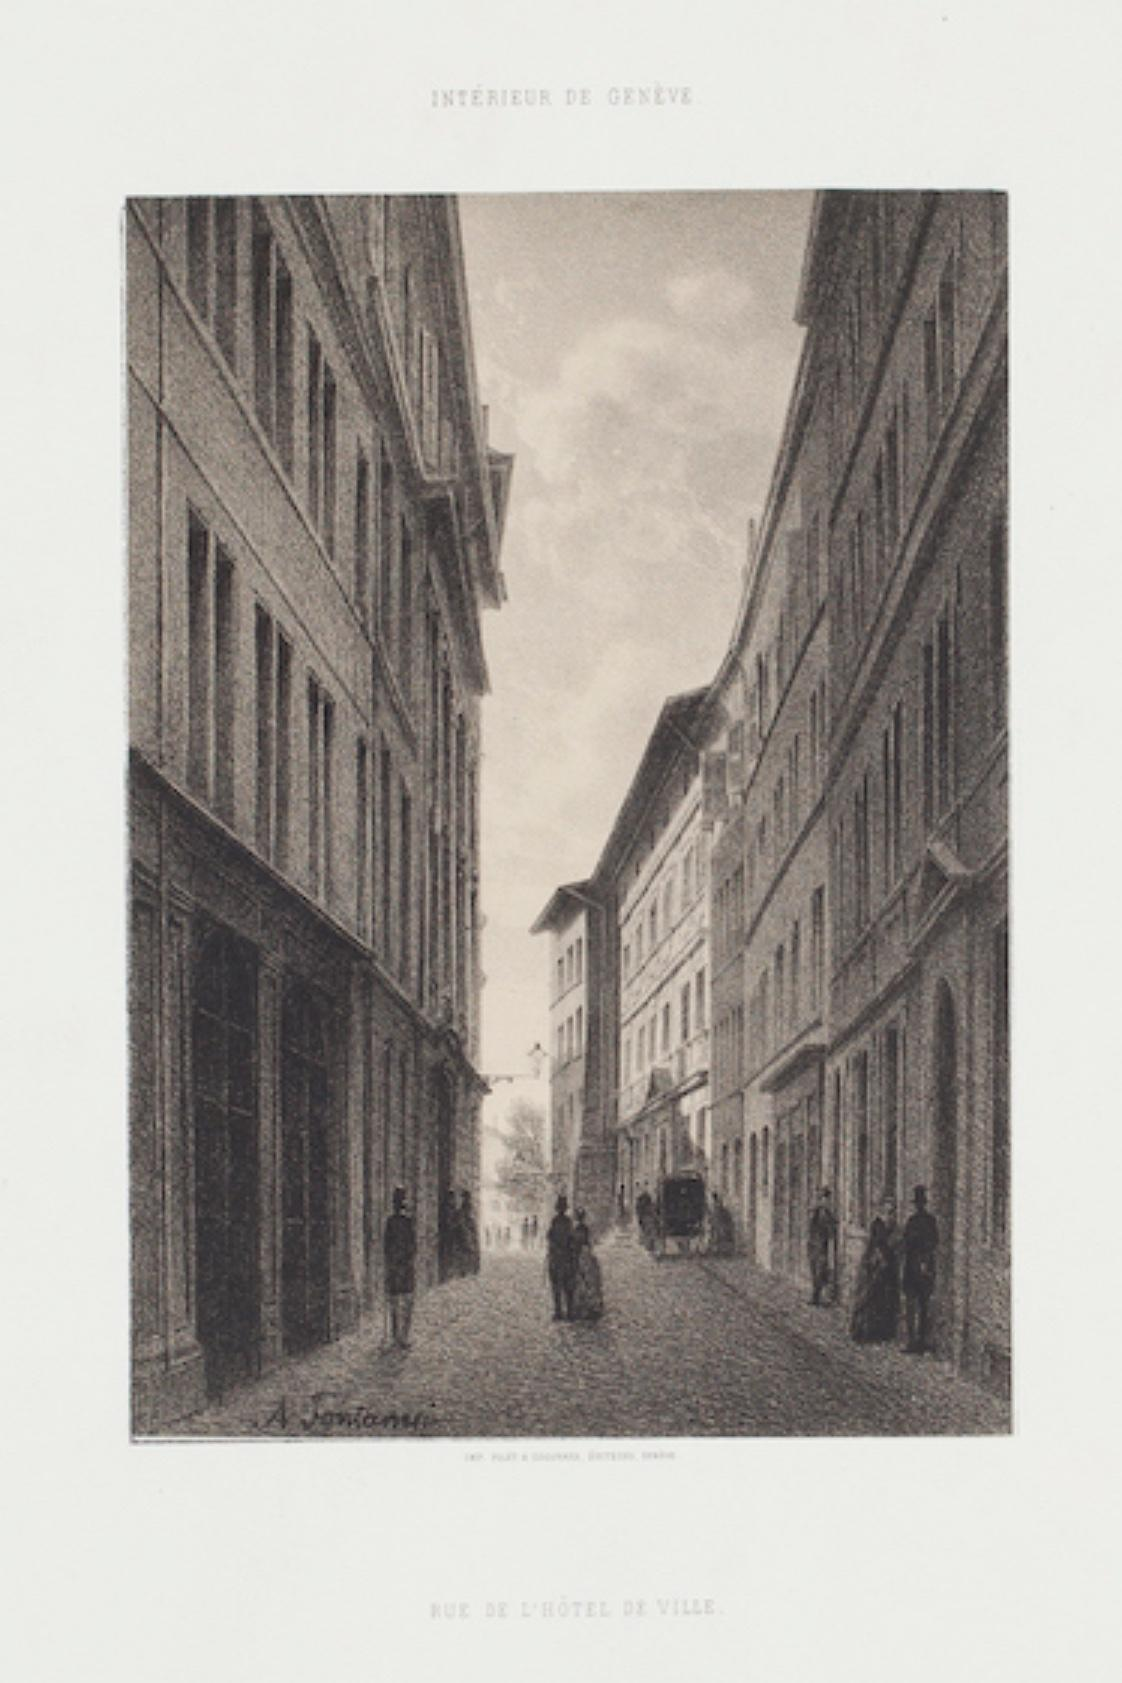 Interior of Geneve - Original Lithograph by Antonio Fontanesi - 19th Century